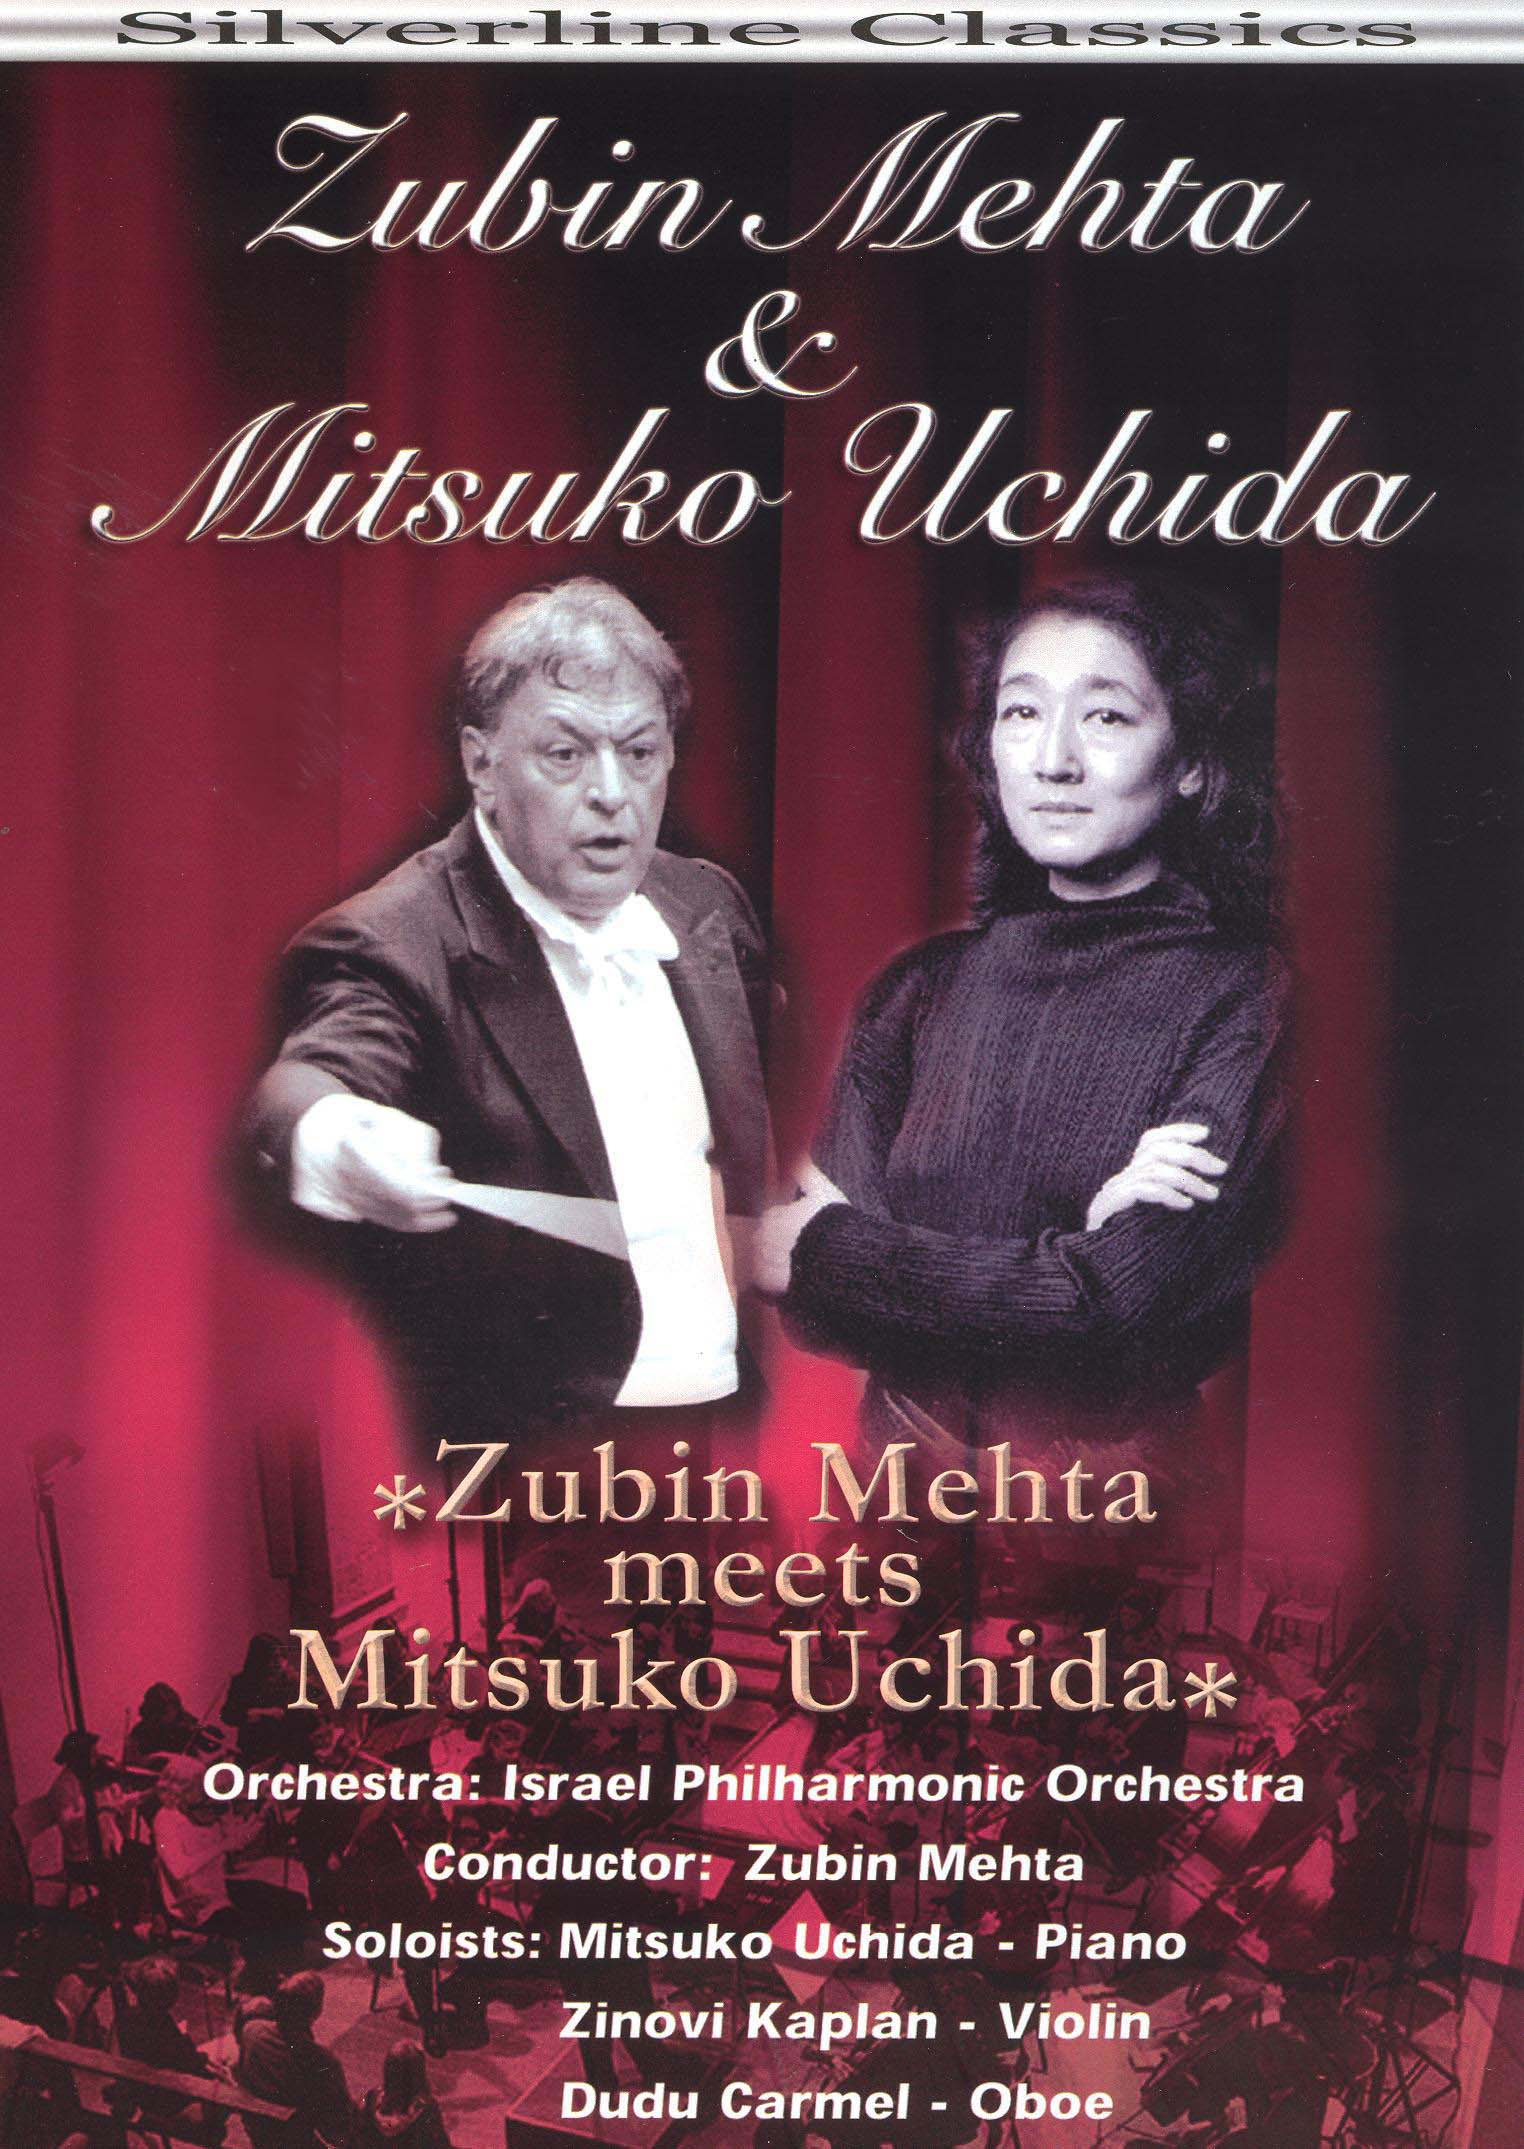 Zubin Mehta Meets Mitsuko Uchida